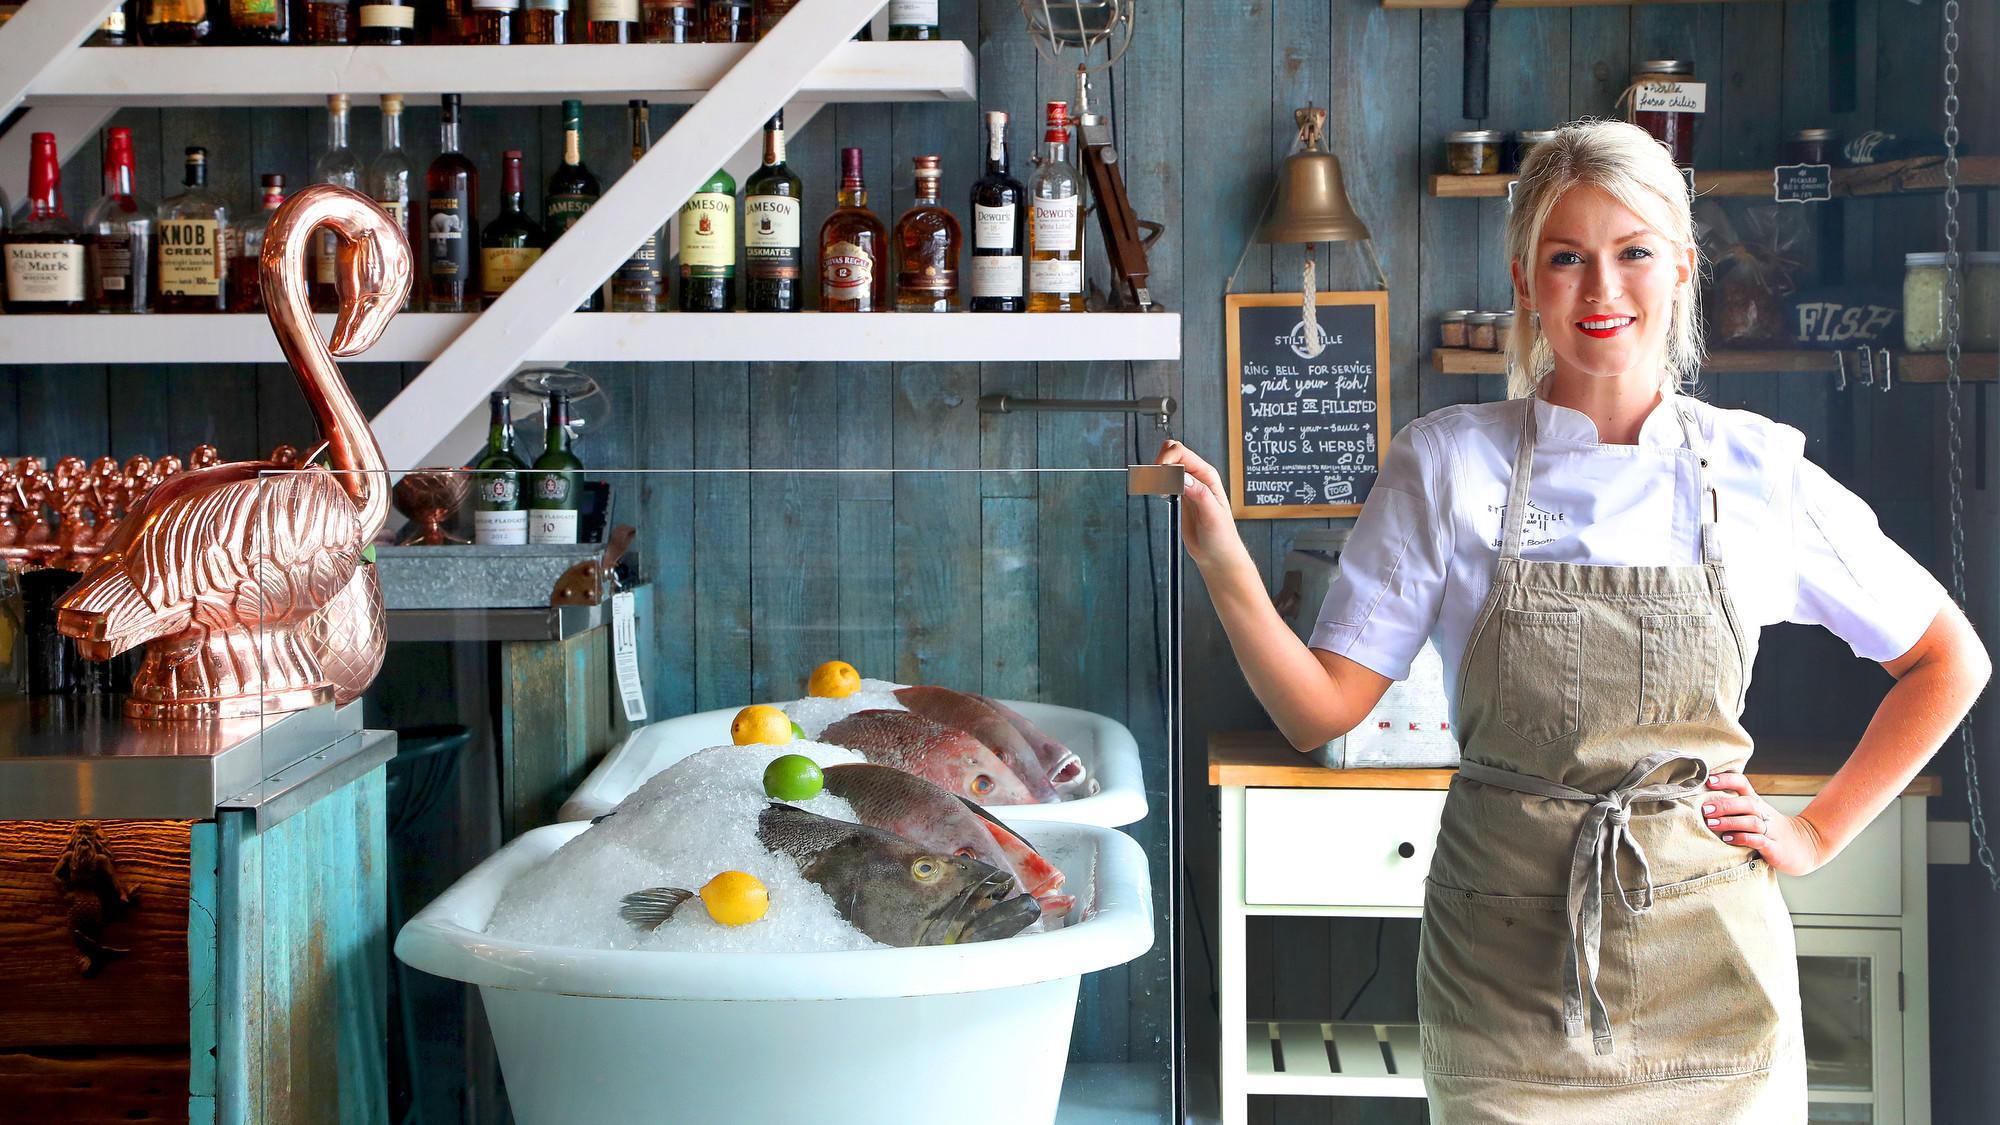 Review stiltsville fish bar in miami beach wobbles with for Stiltsville fish bar